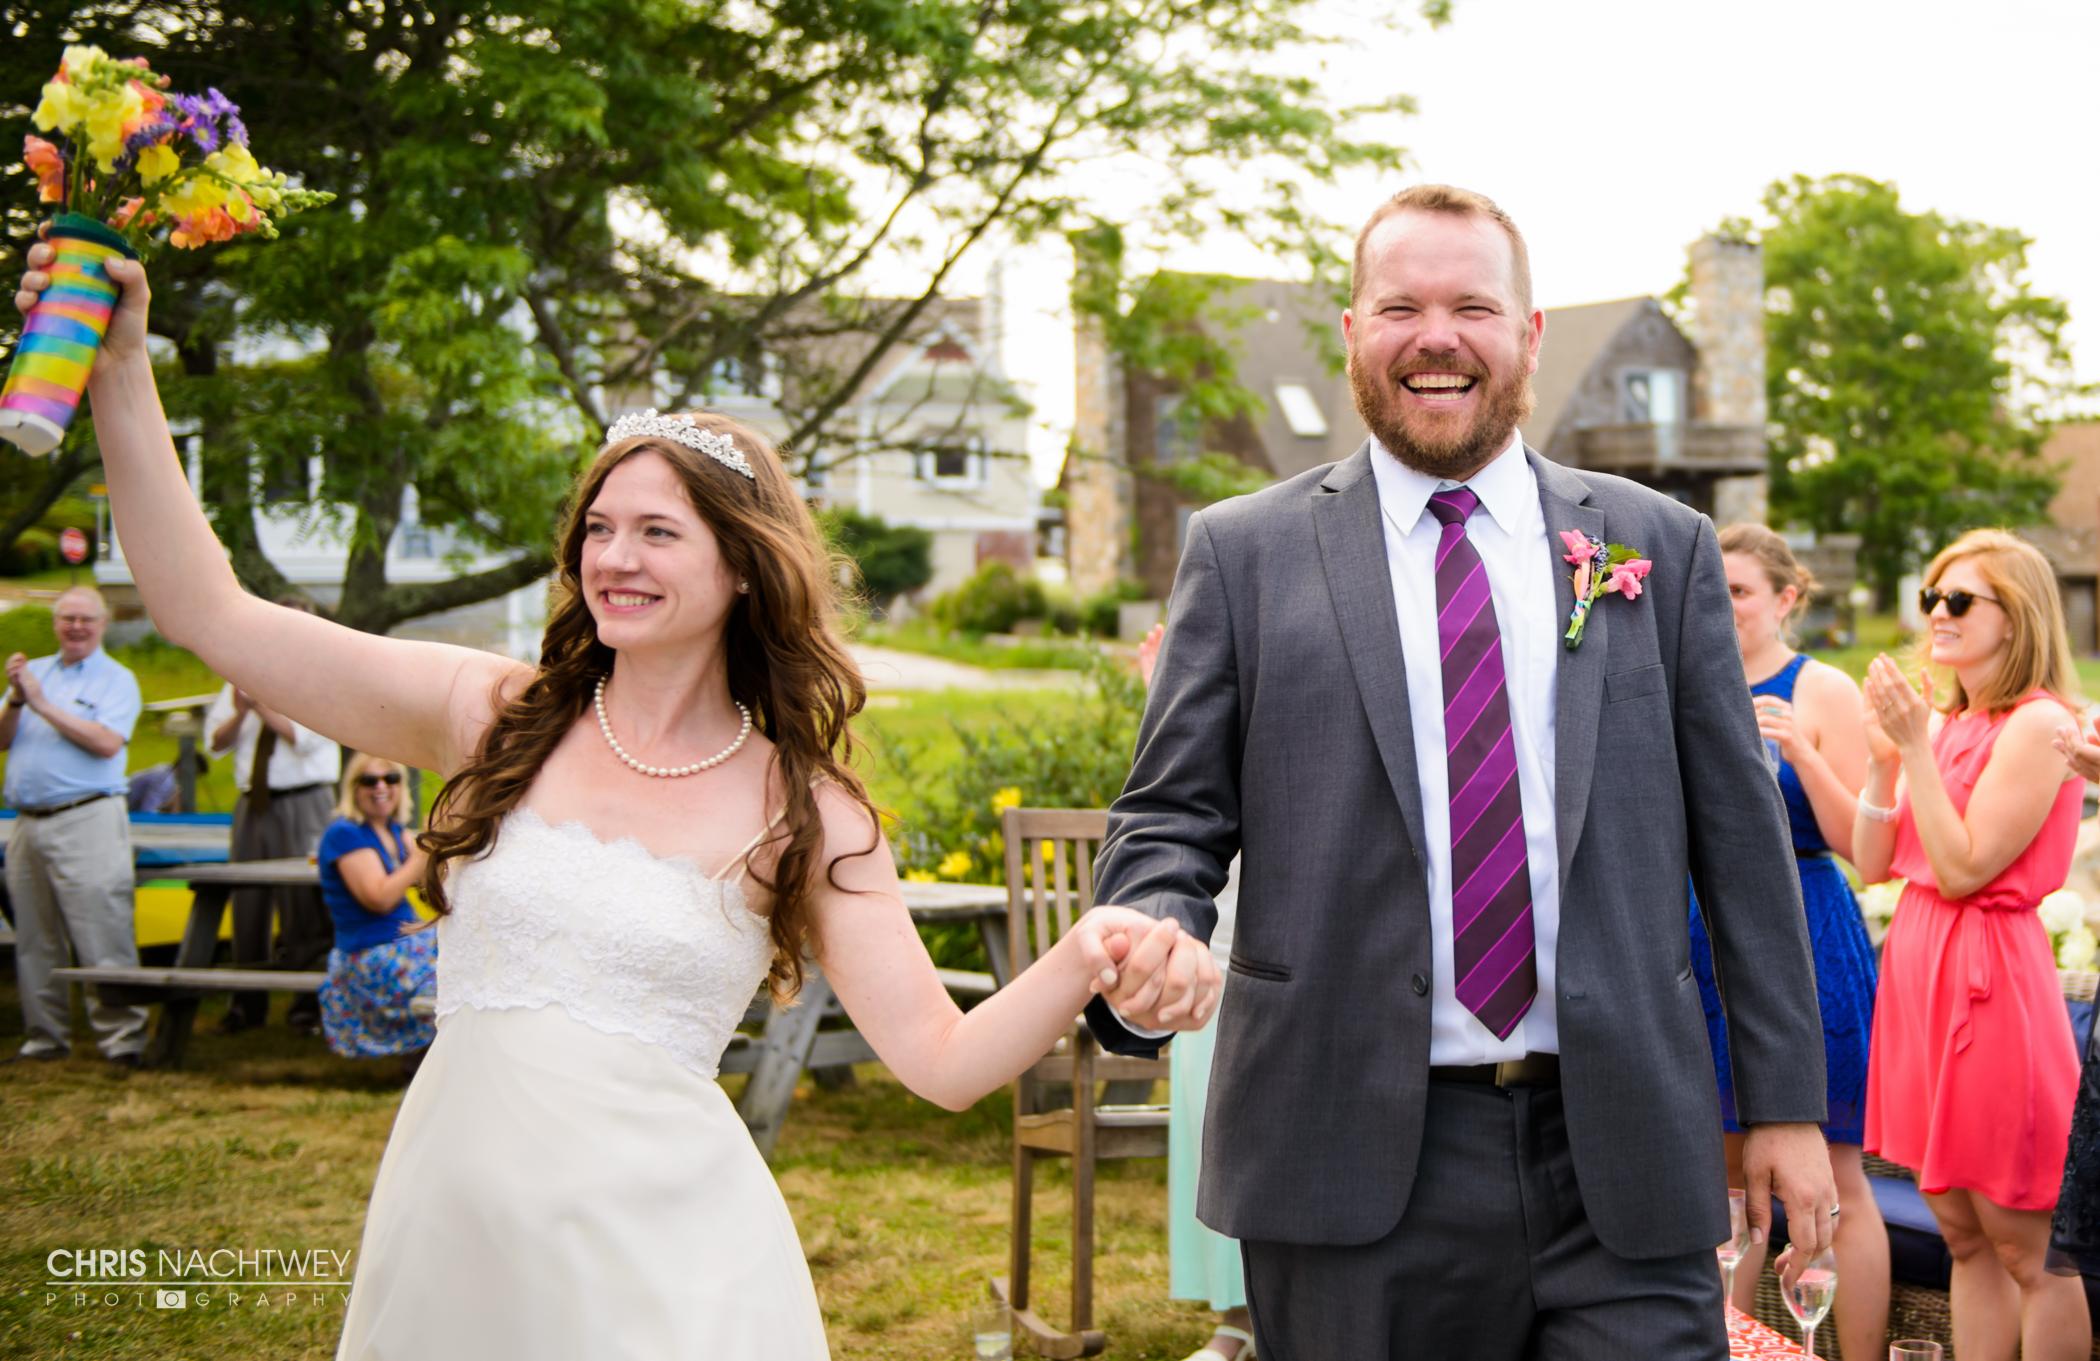 noank-ct-wedding-photos-chris-nachtwey-2016.jpg